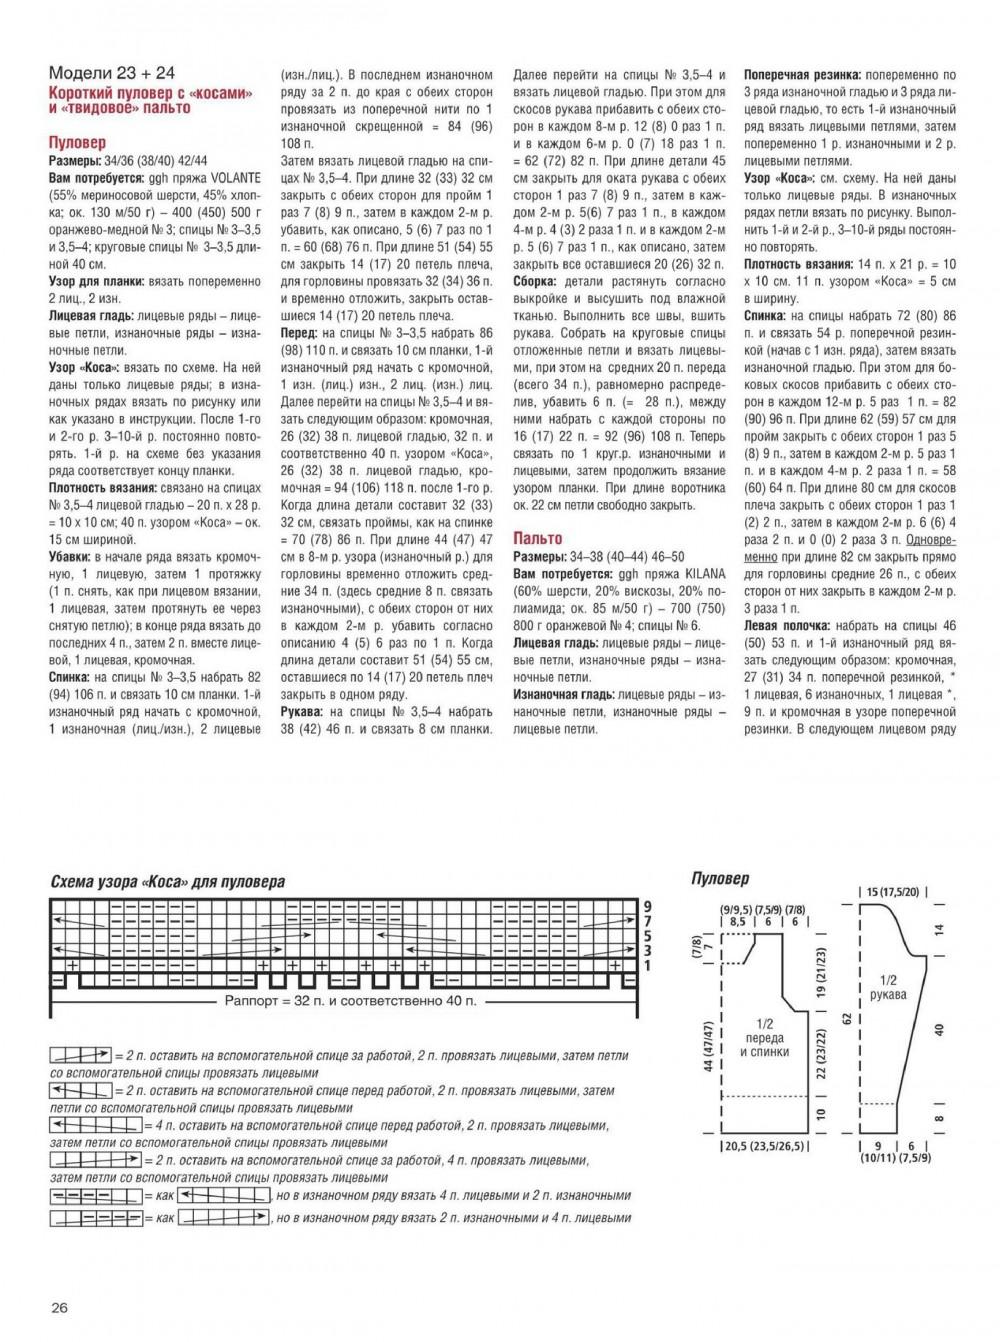 Page_00026.jpg